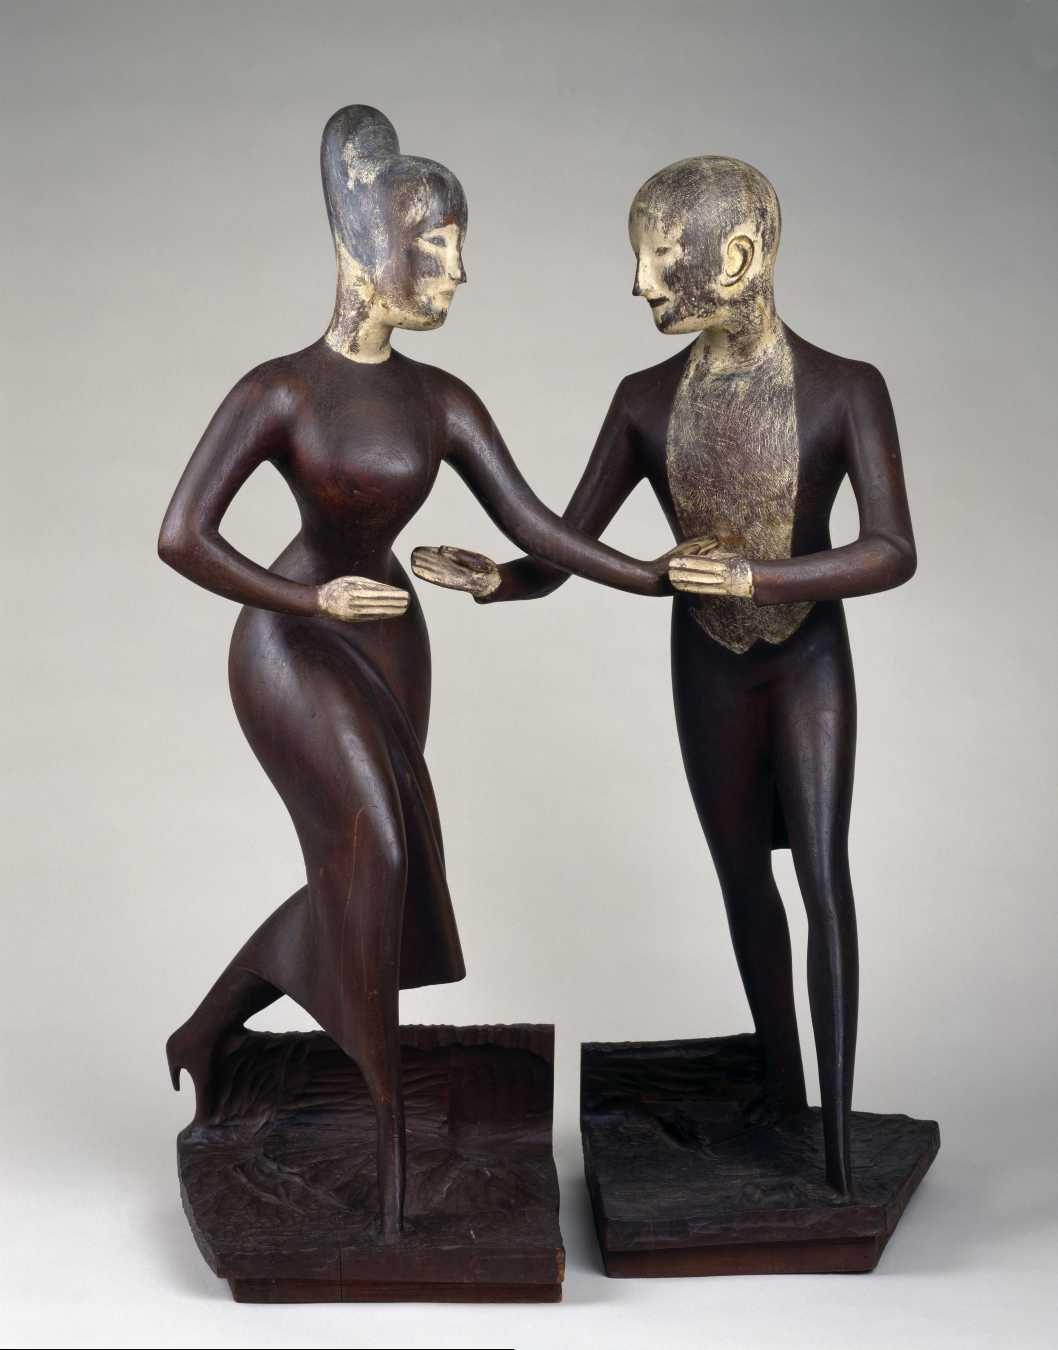 Elie Nadelman, Tango, c. 1918–24